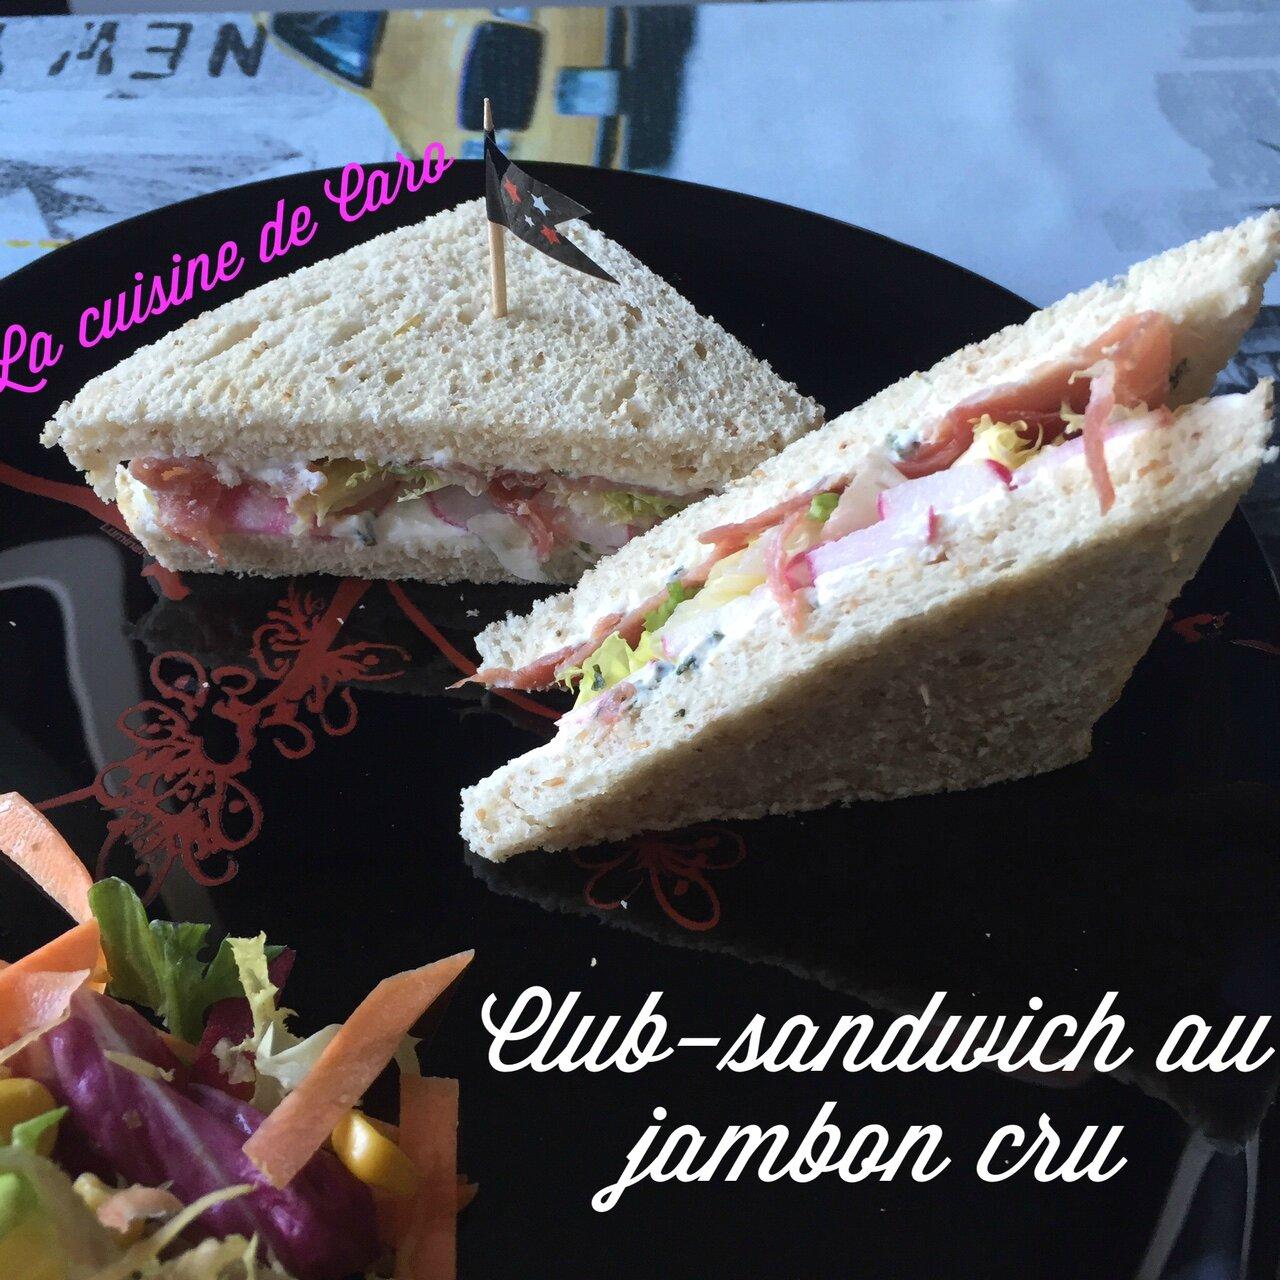 Club - sandwich au jambon cru